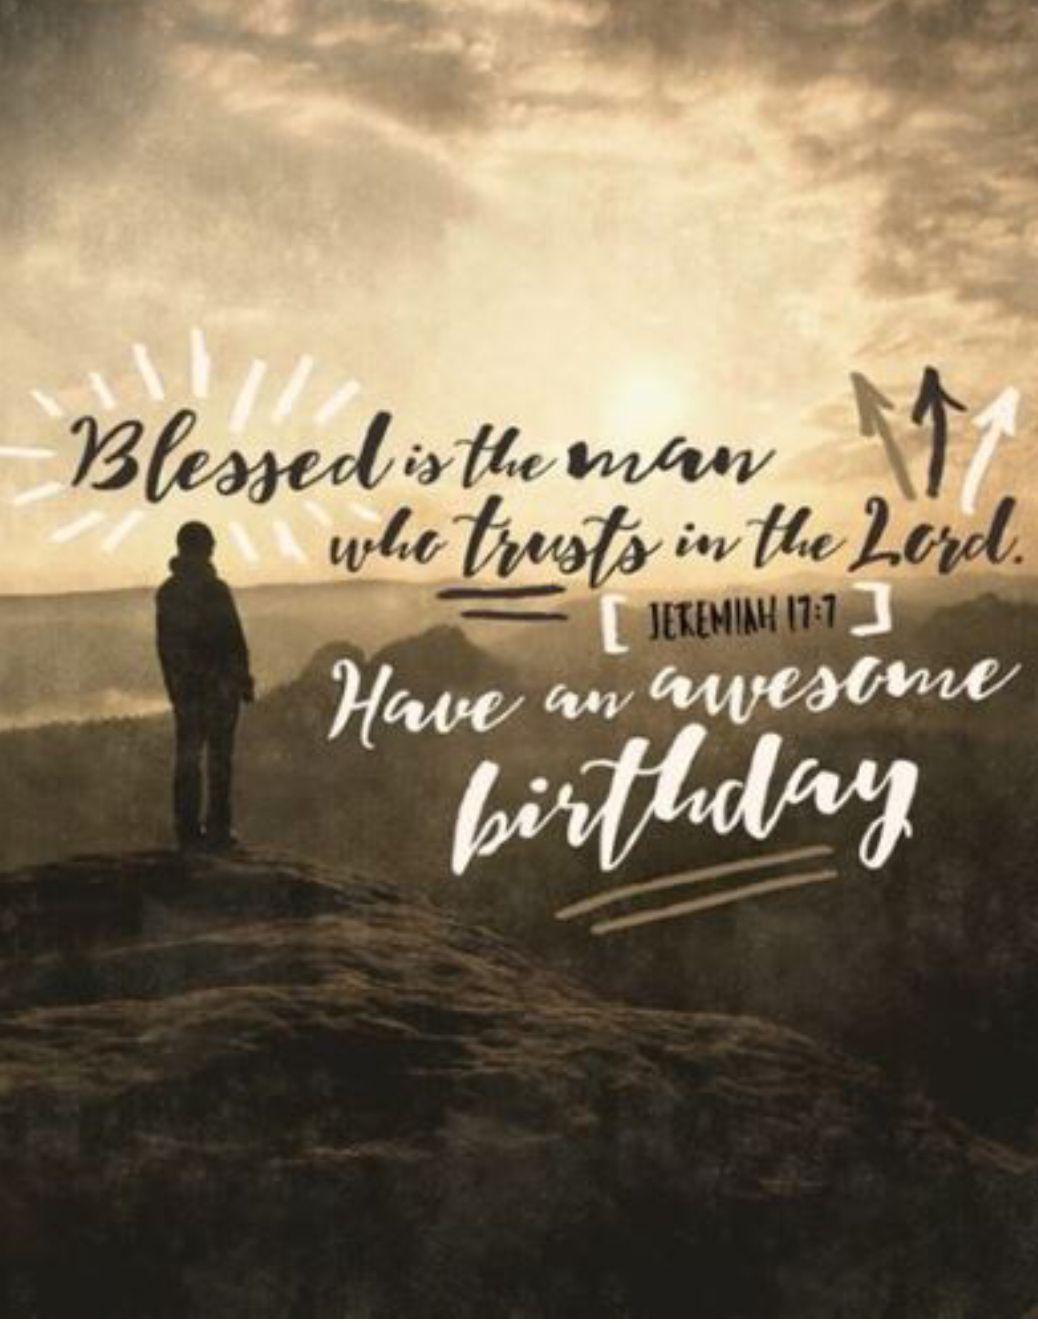 Pin by vvvvvvvvvvvvvvvvvvvvvvvvvvvvv on Birthday greetings